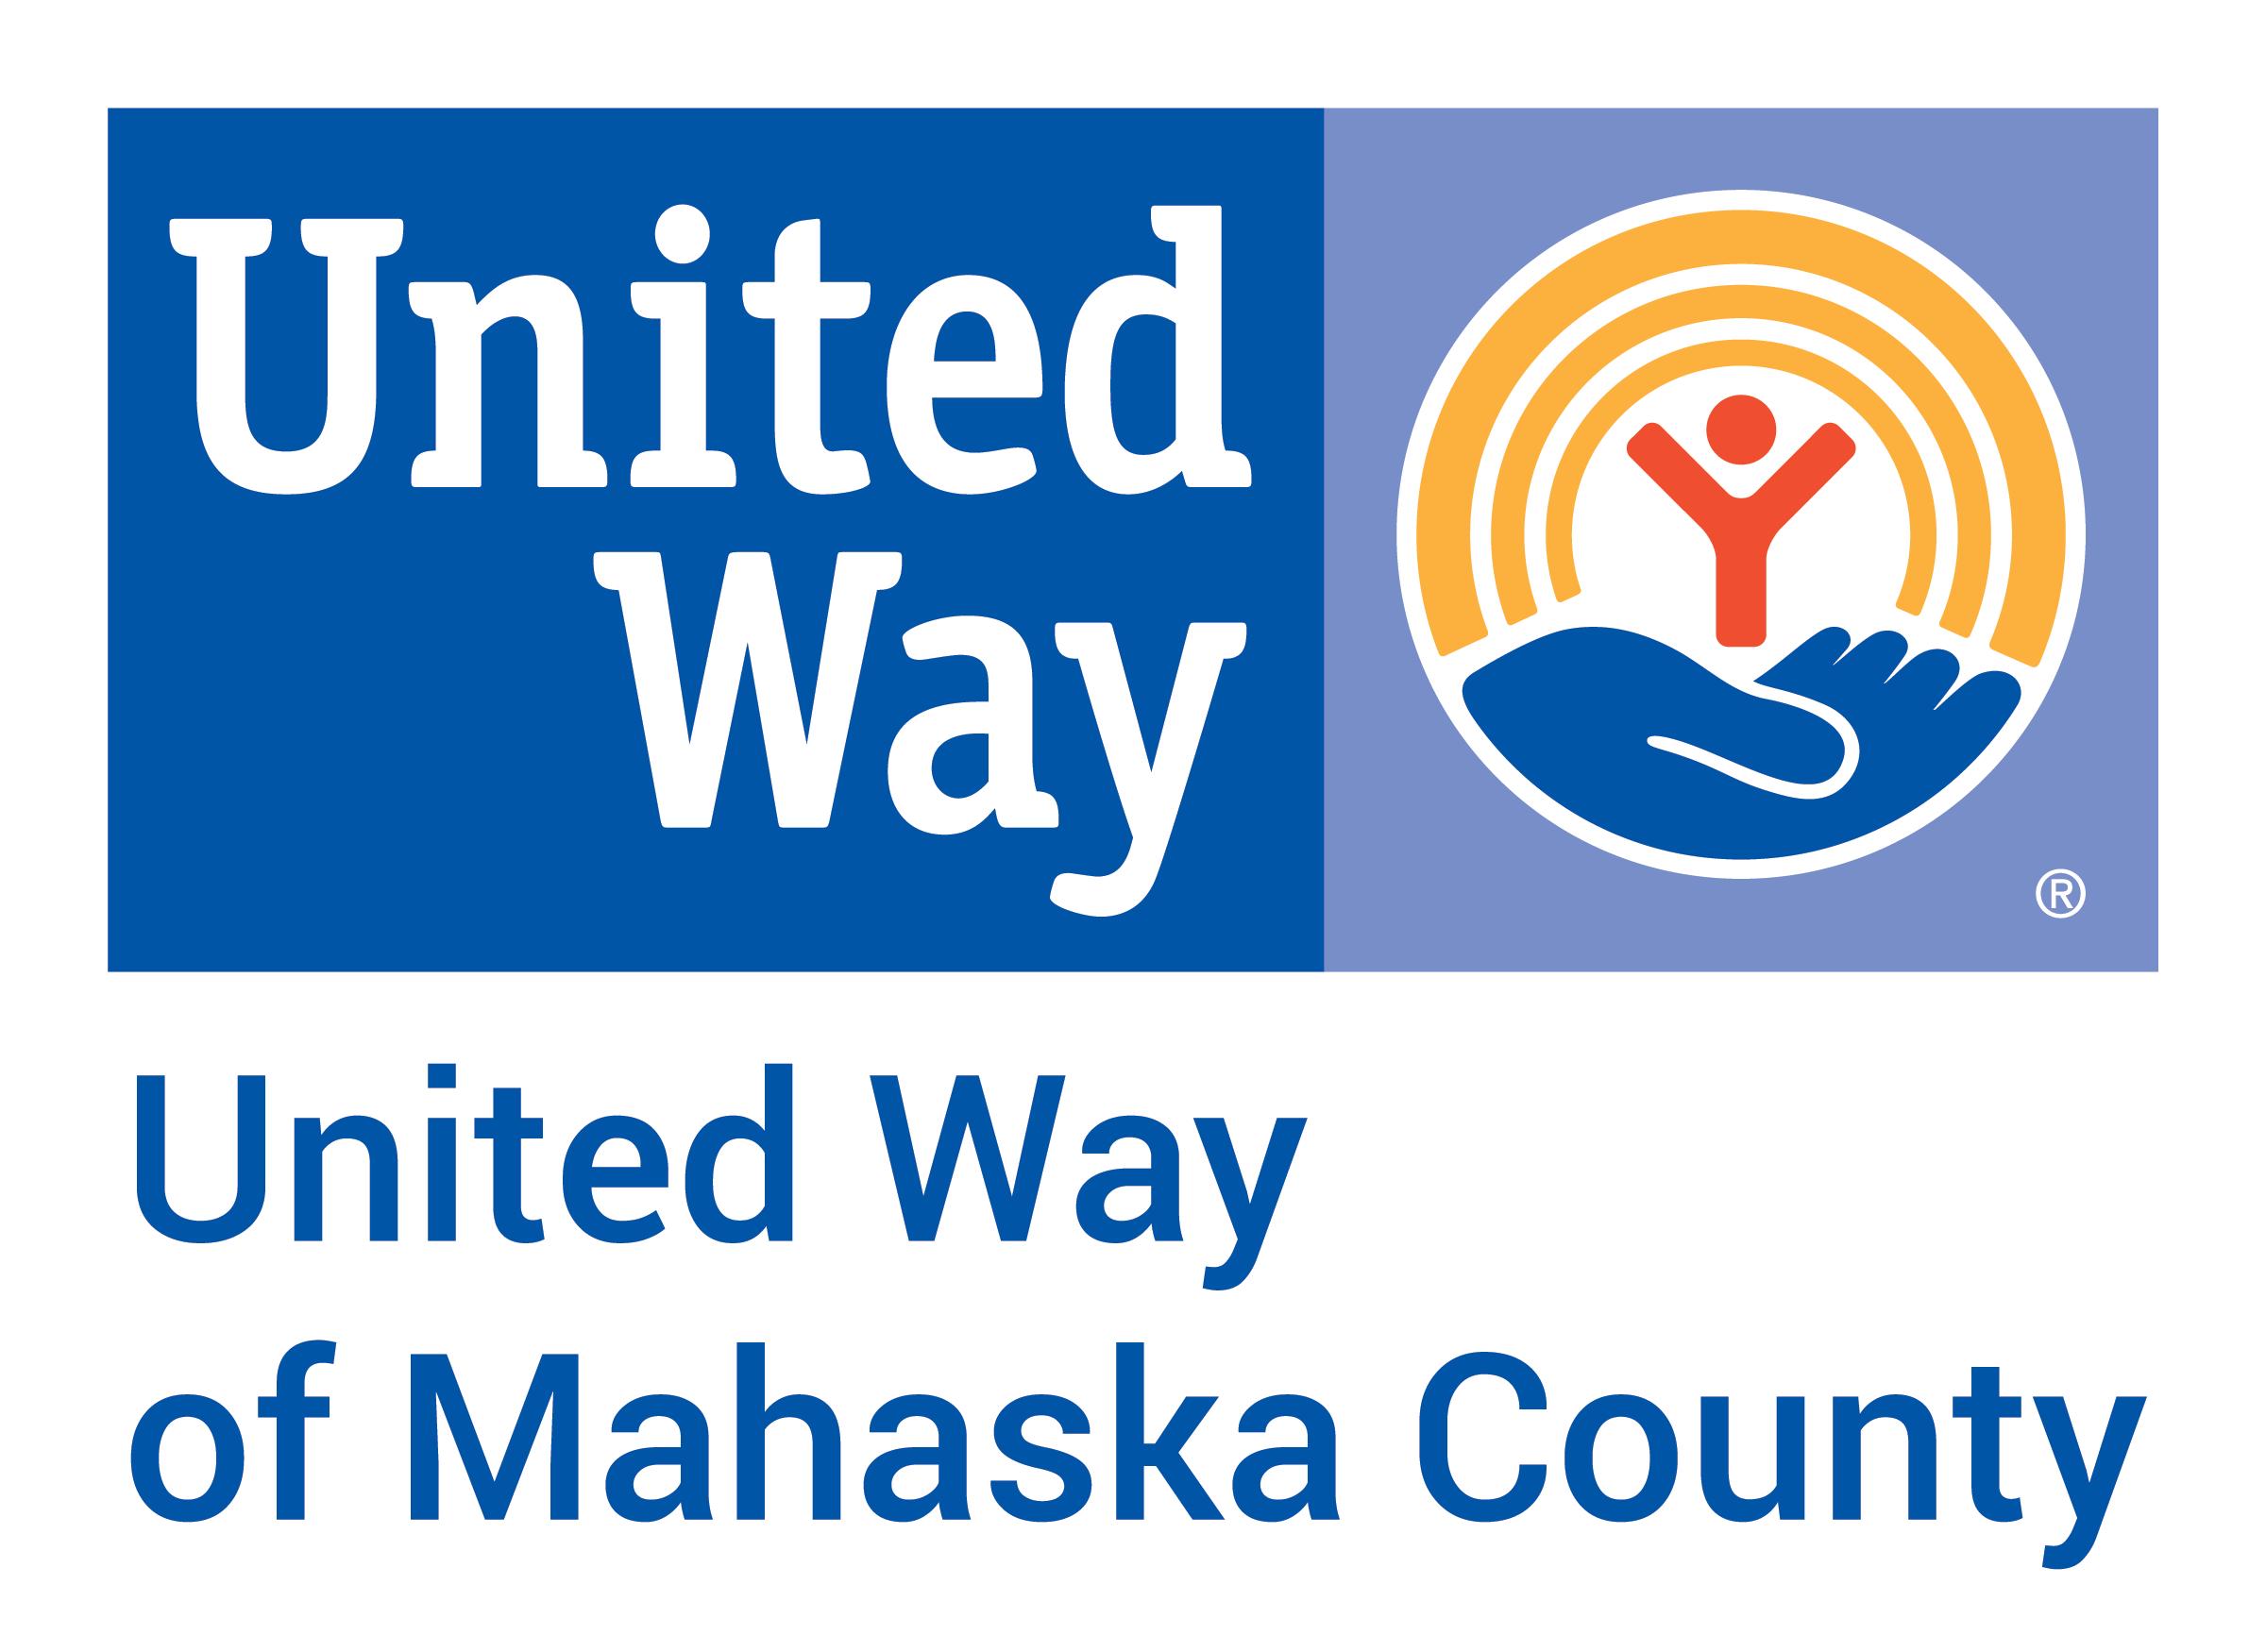 United Way of Mahaska County